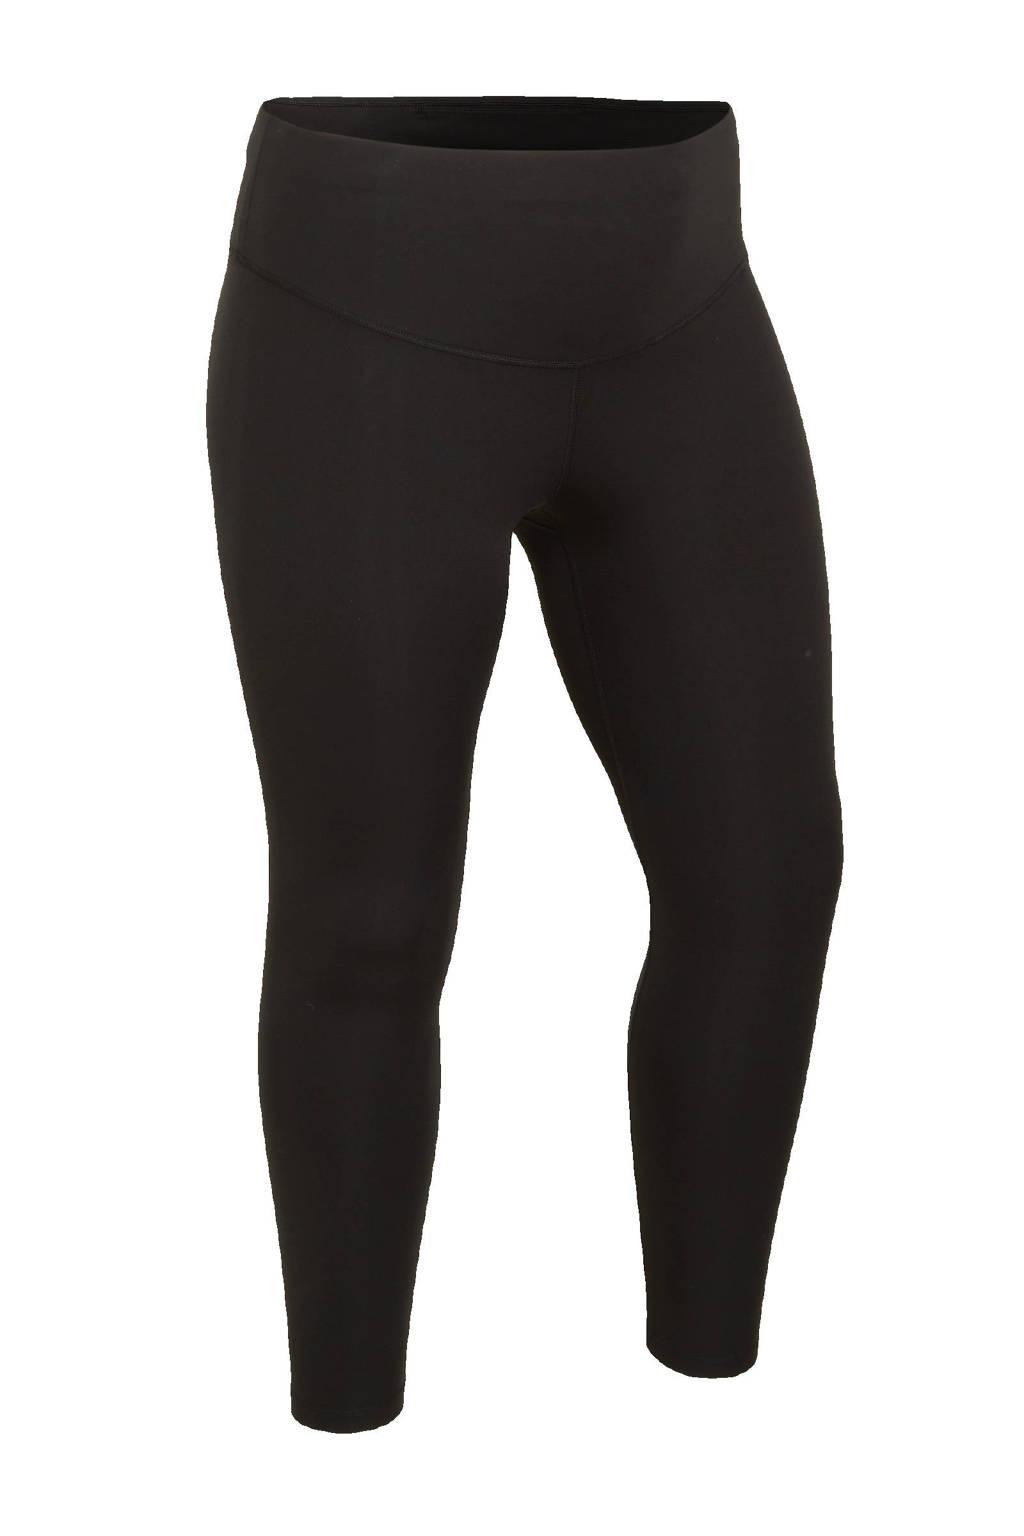 Nike Plus Size hardloopbroek zwart, Zwart